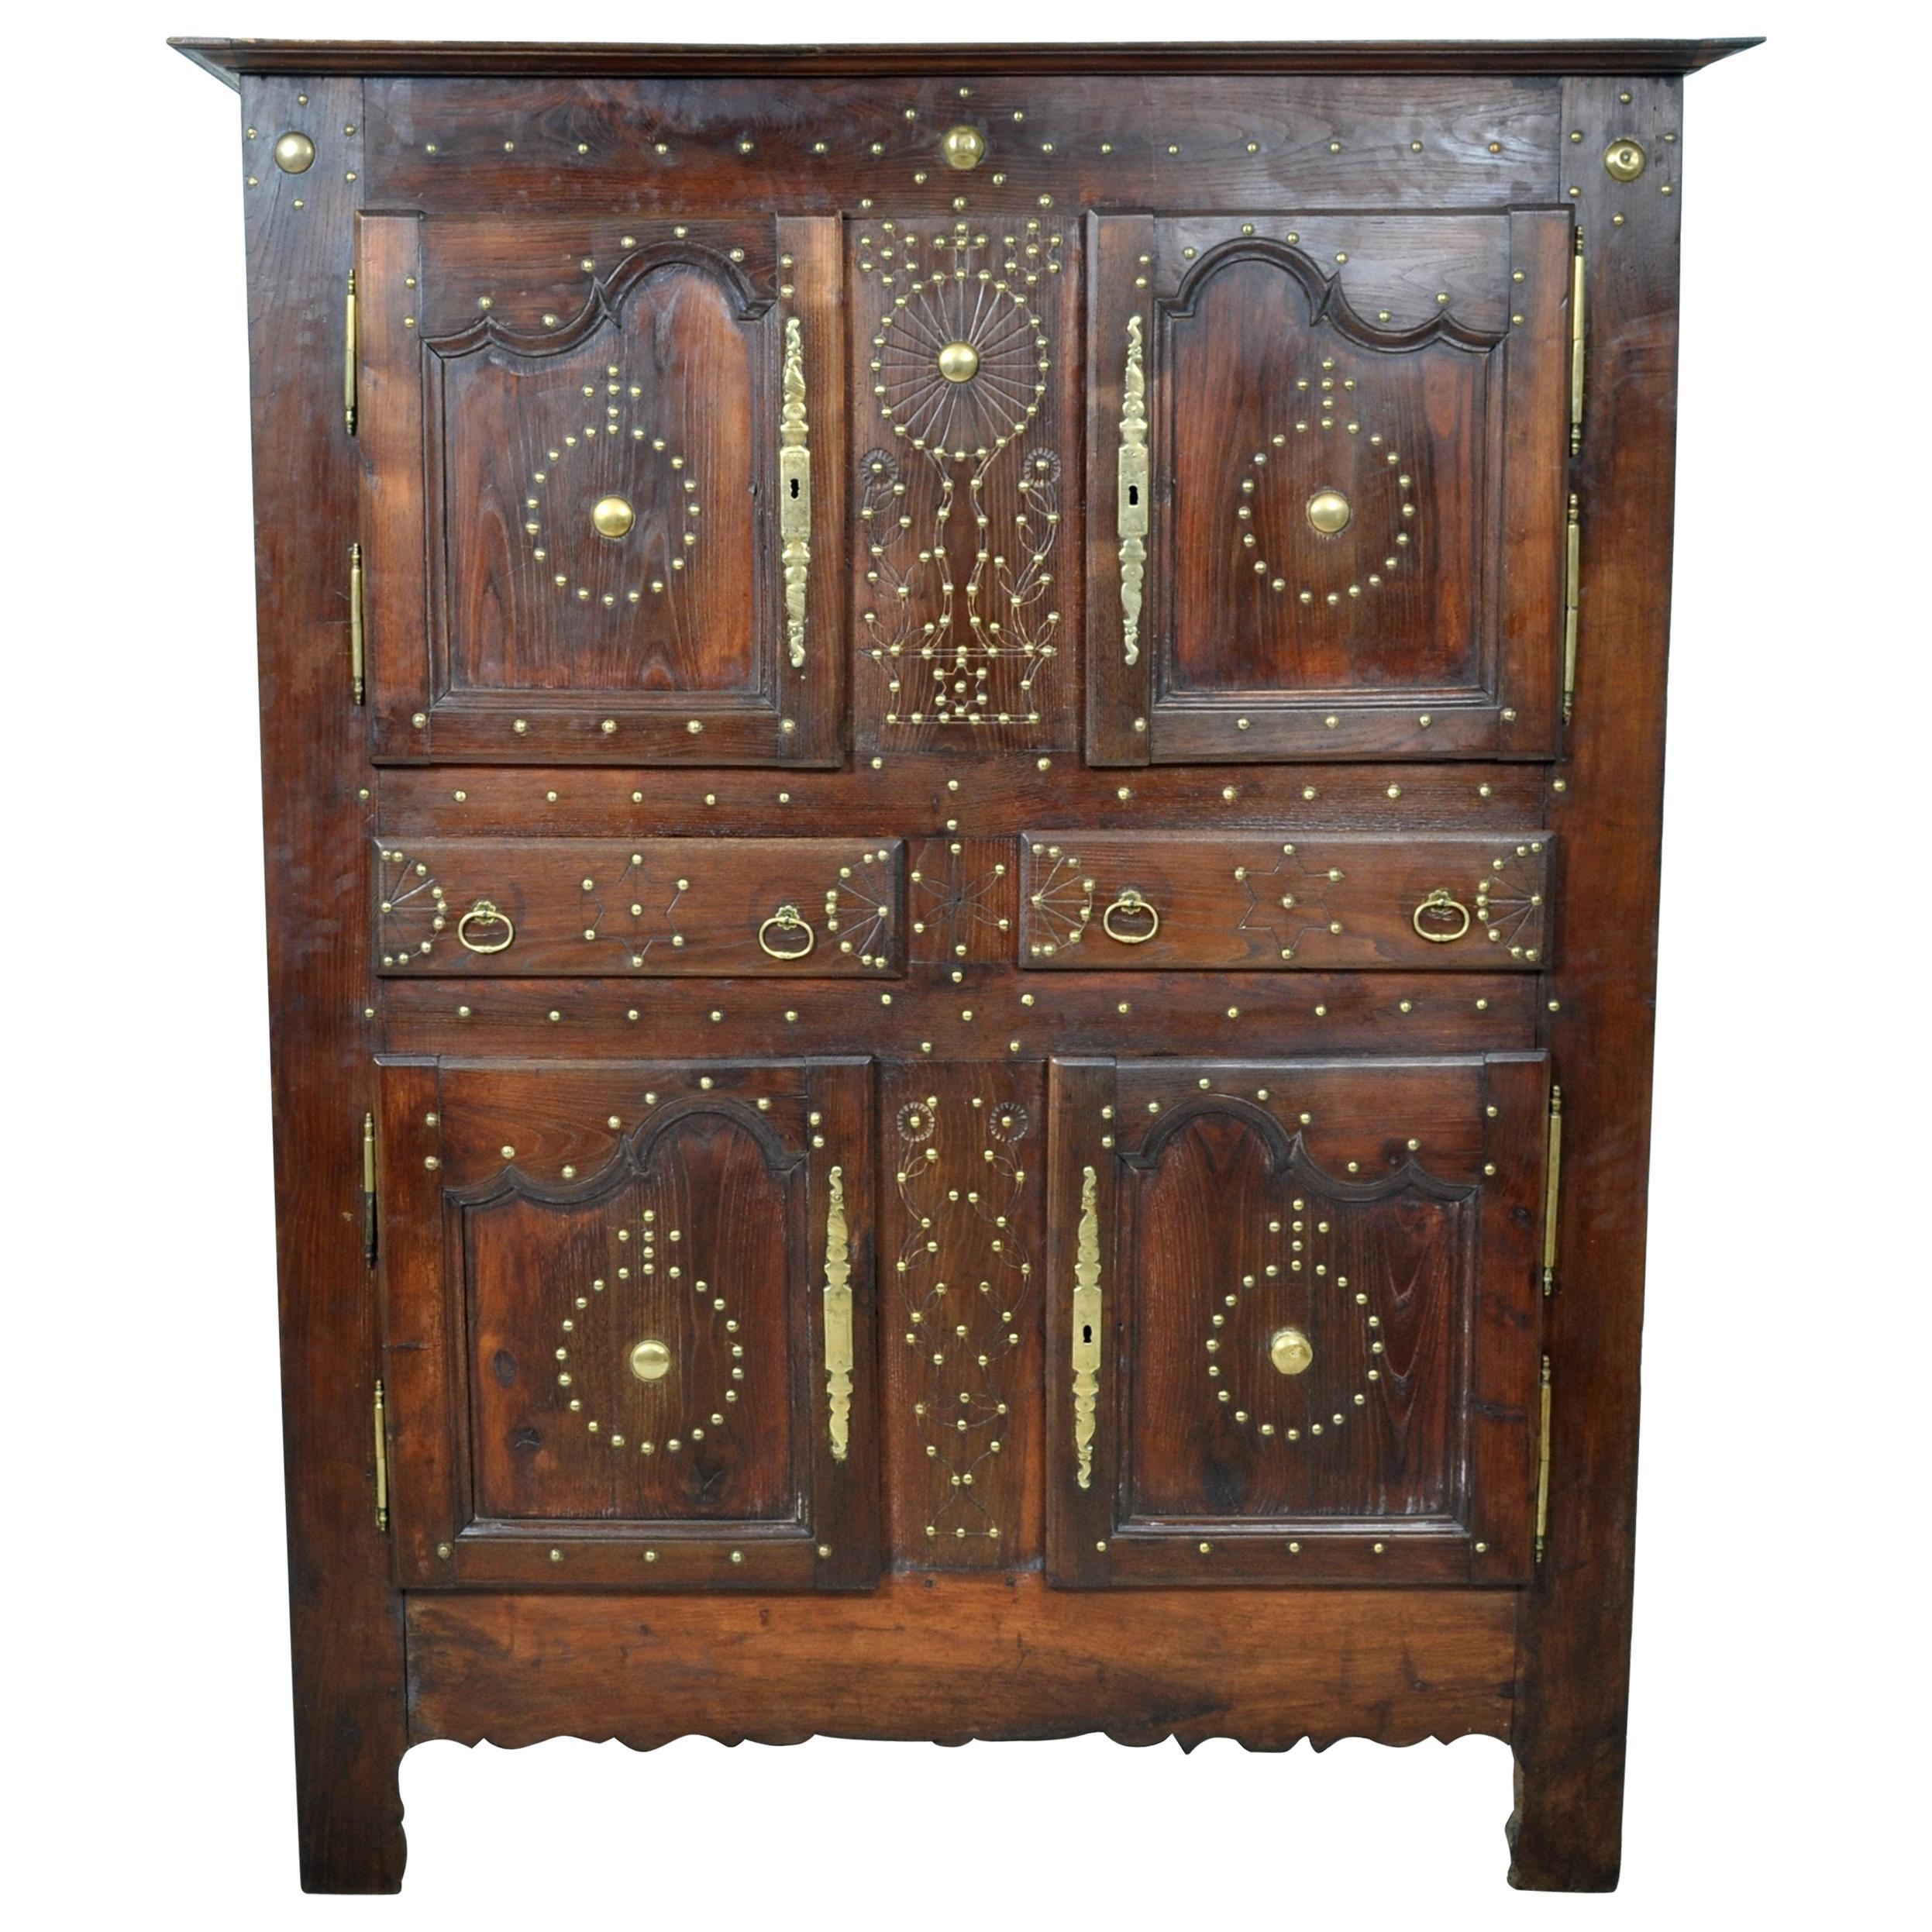 18th Century French Provincial Chestnut Brass Studwork Cabinet Cupboard Ca. 1720